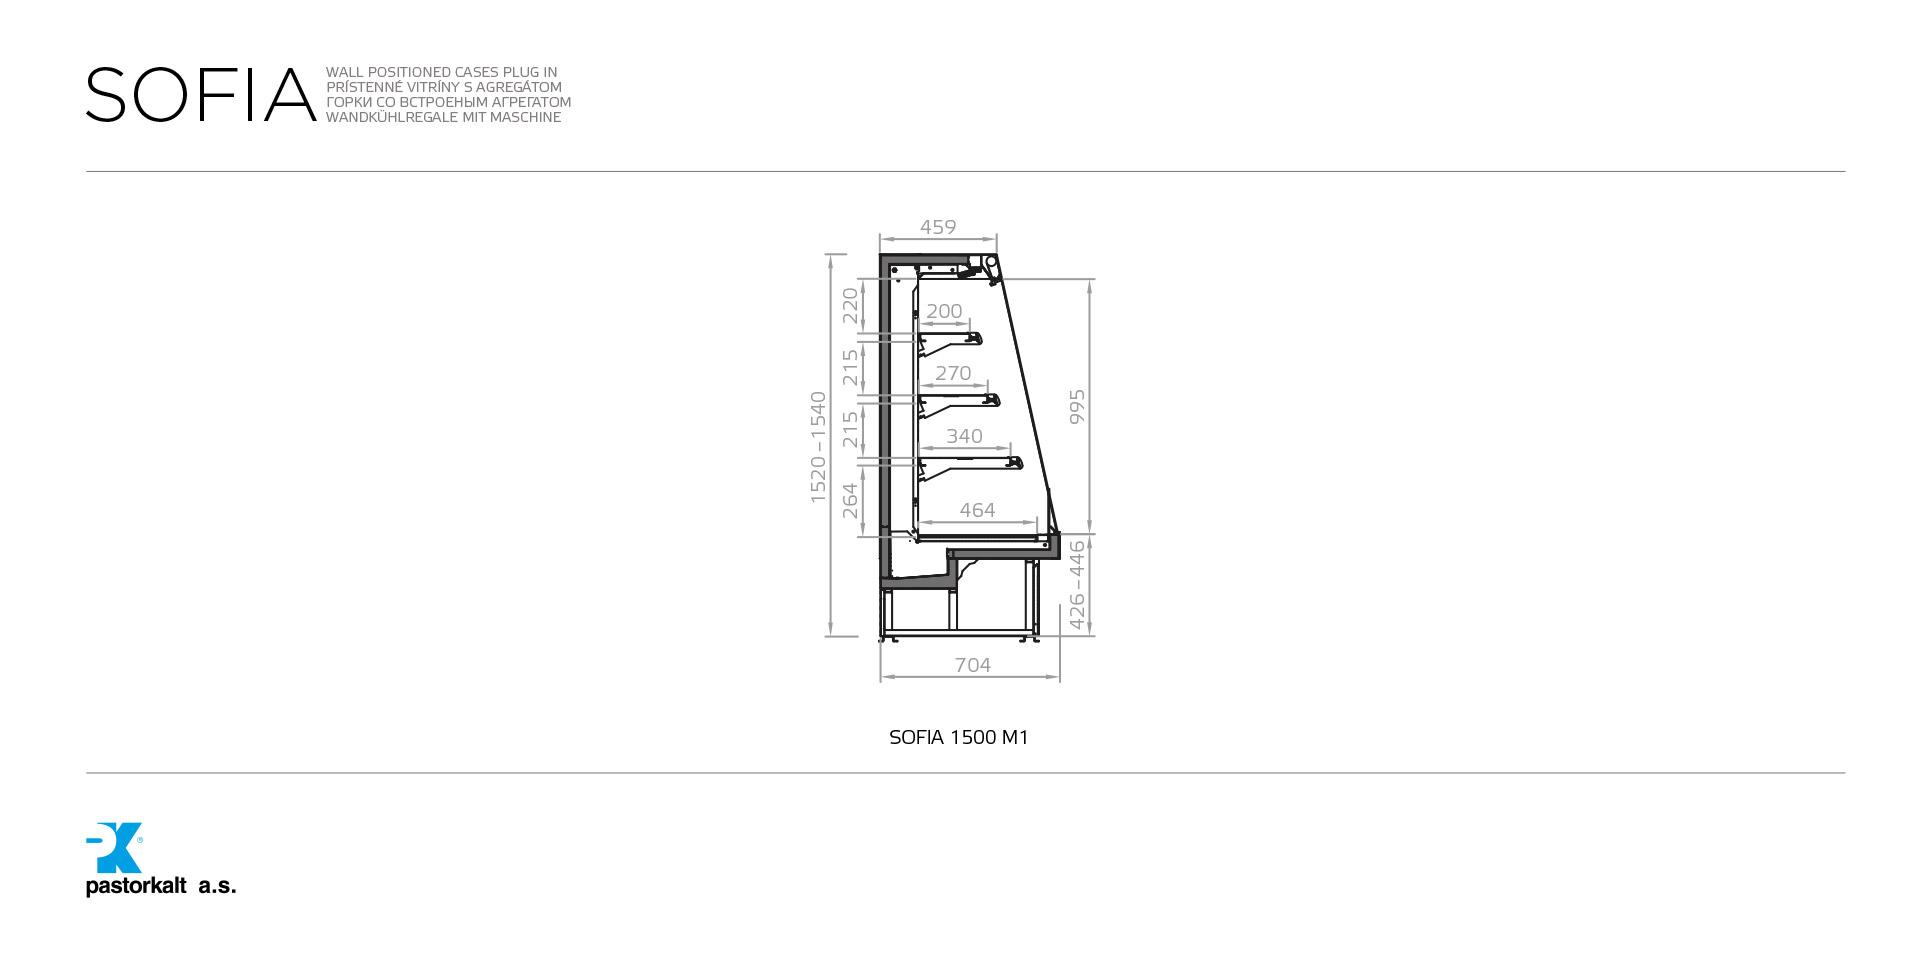 разрез  - SOFIA 1500 M1 - Kühlversion, Höhe 1500